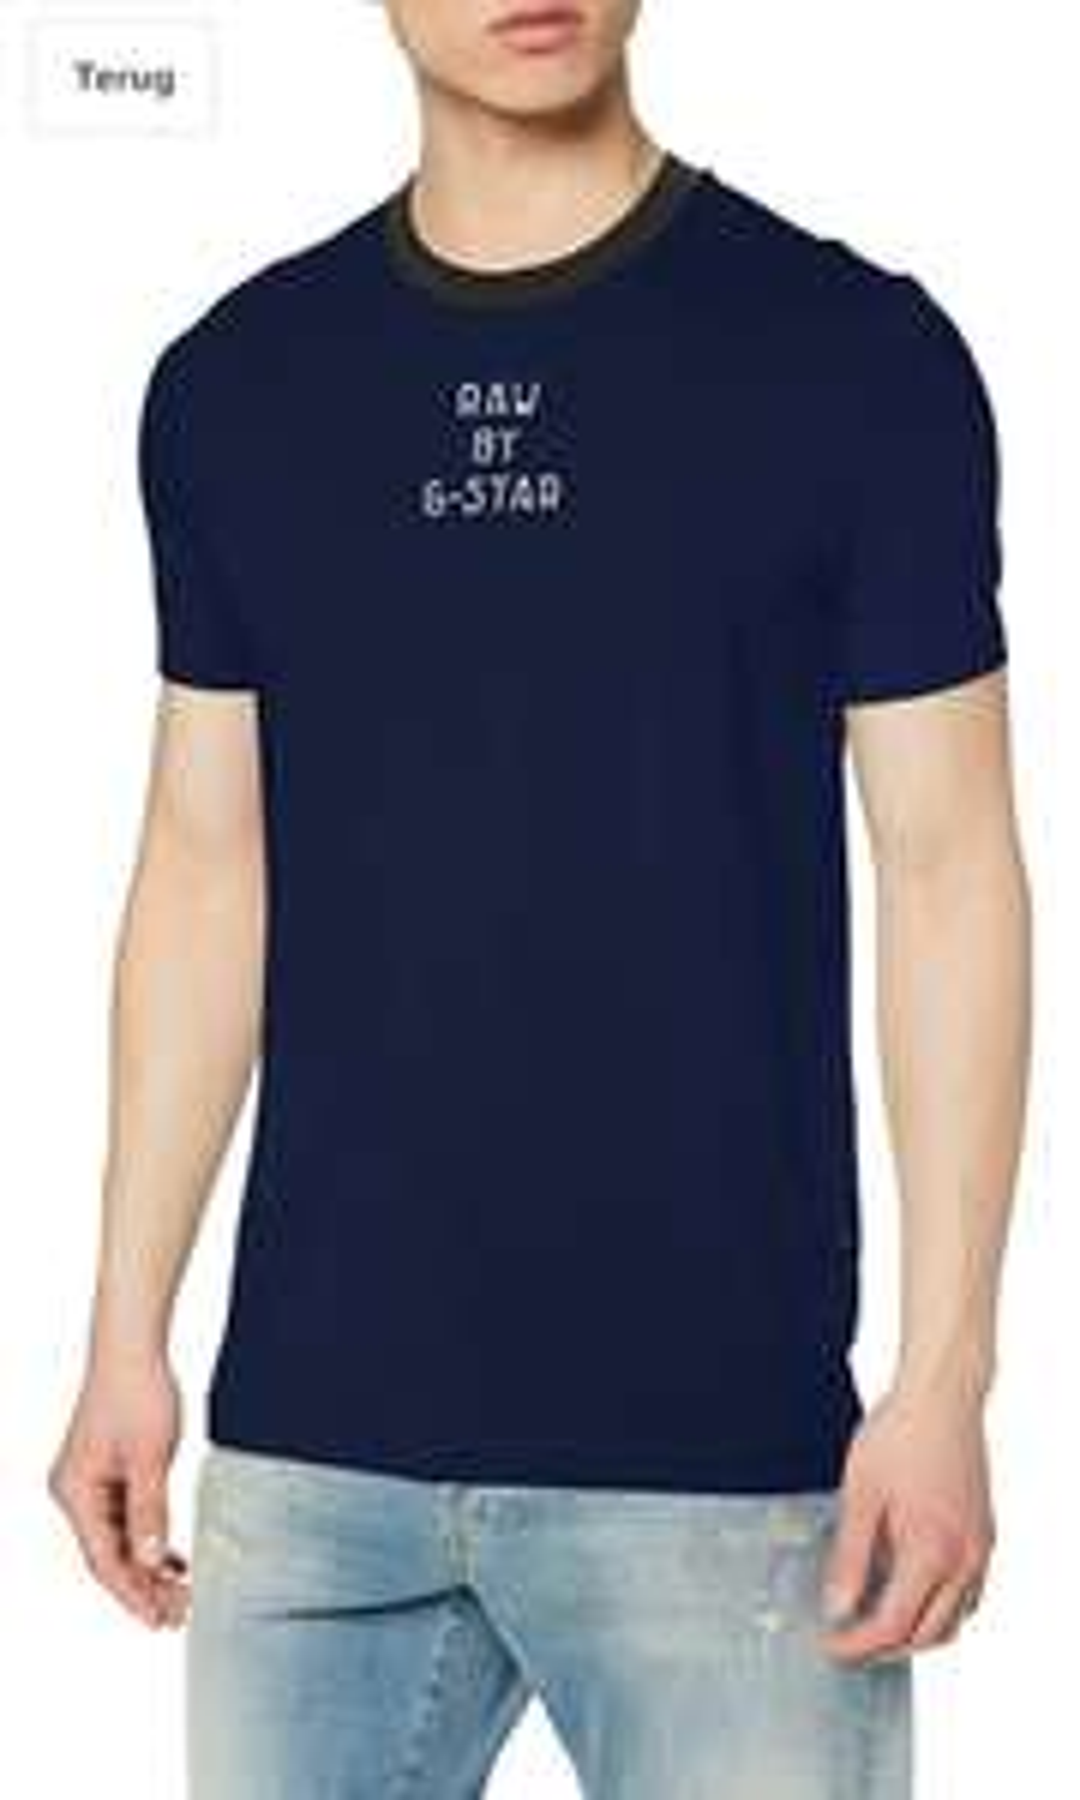 G-Star RAW Heren Text GR Slim Fit T-Shirt